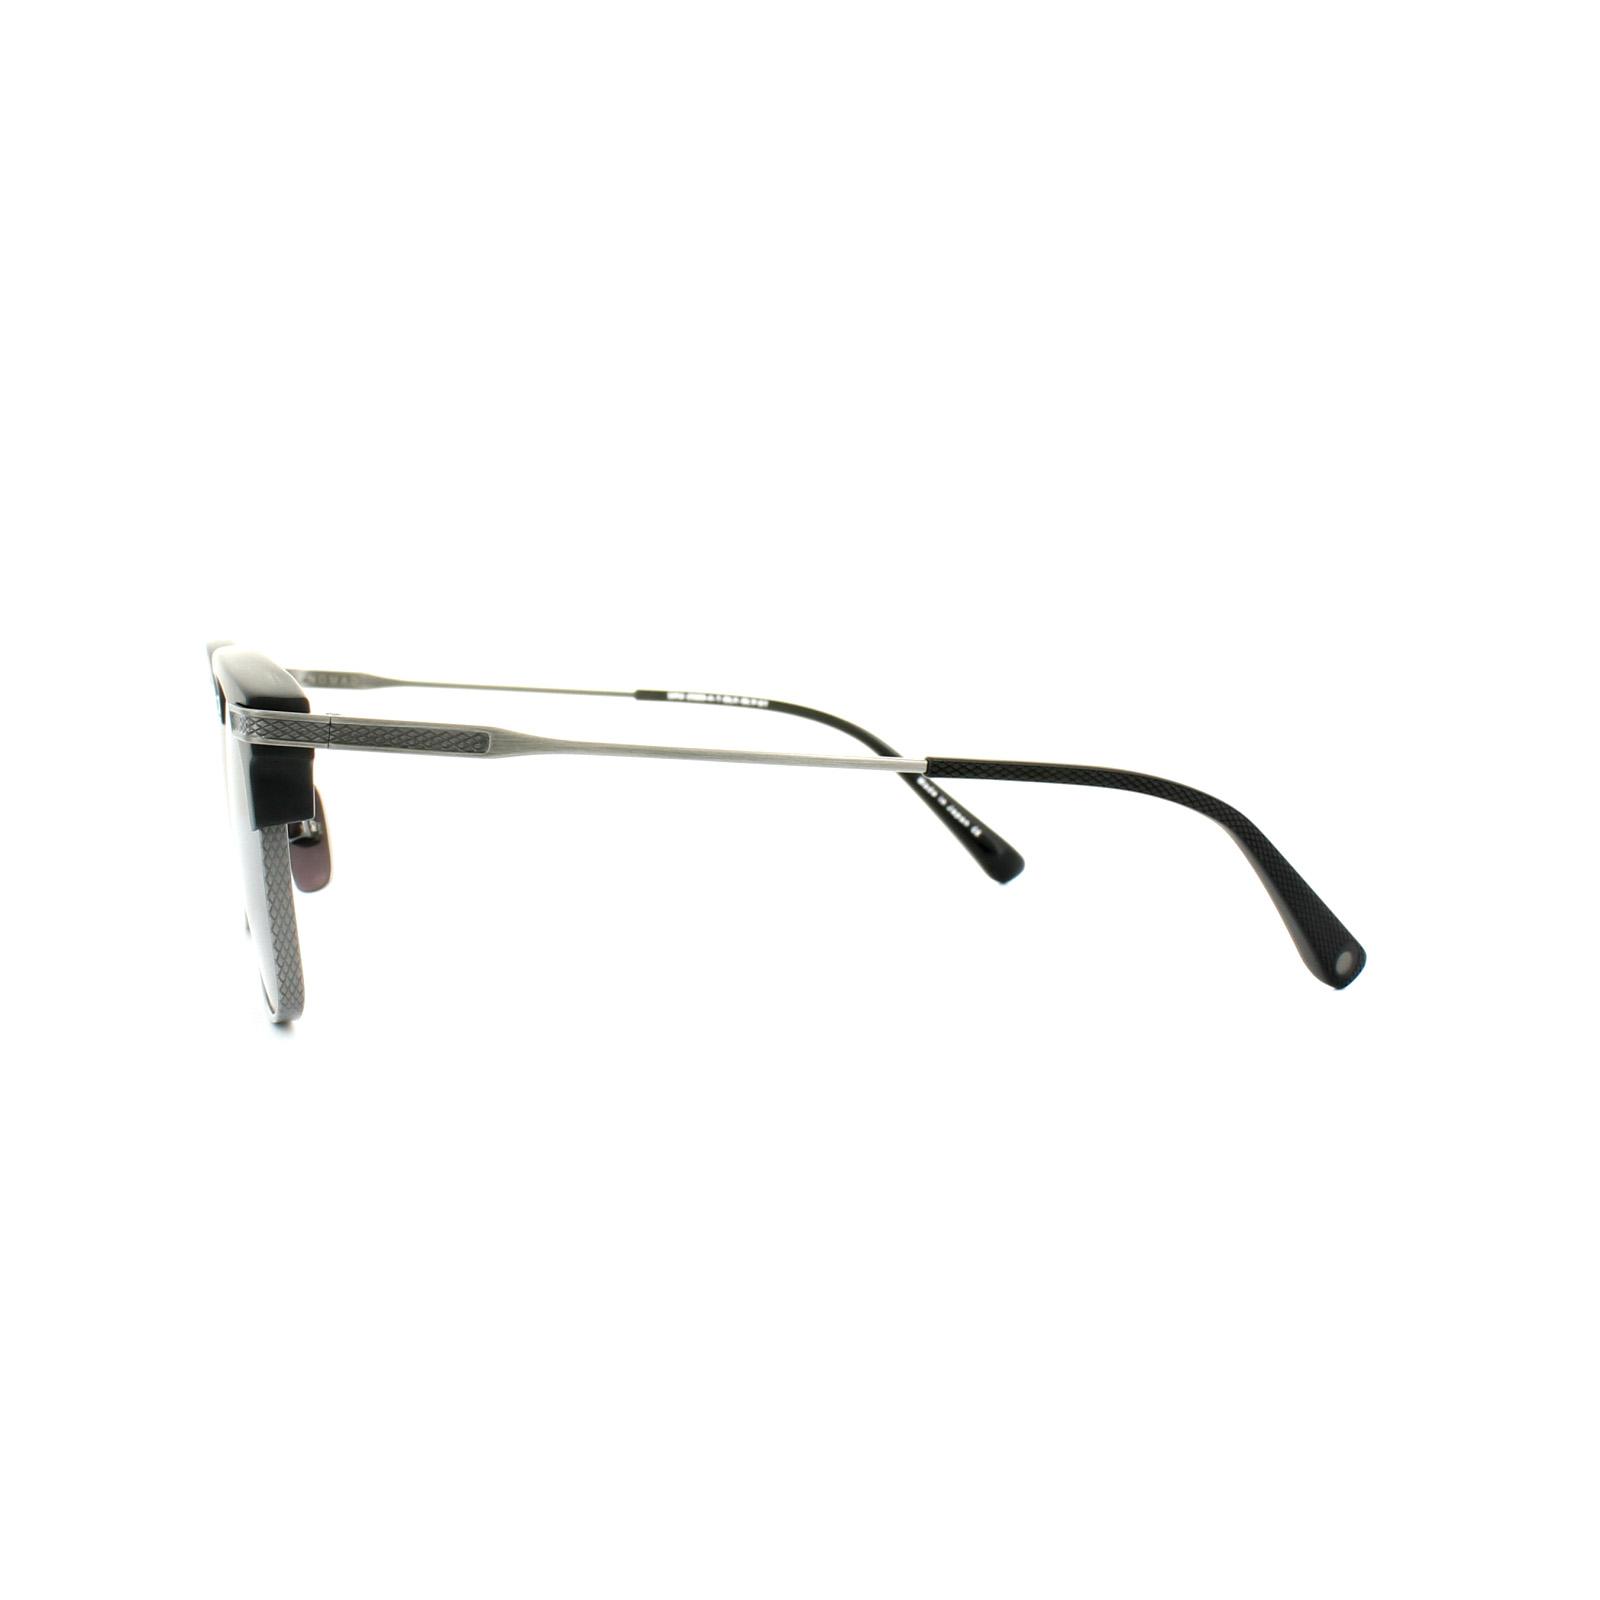 4630913a63 Cheap Dita Nomad Sunglasses - Discounted Sunglasses